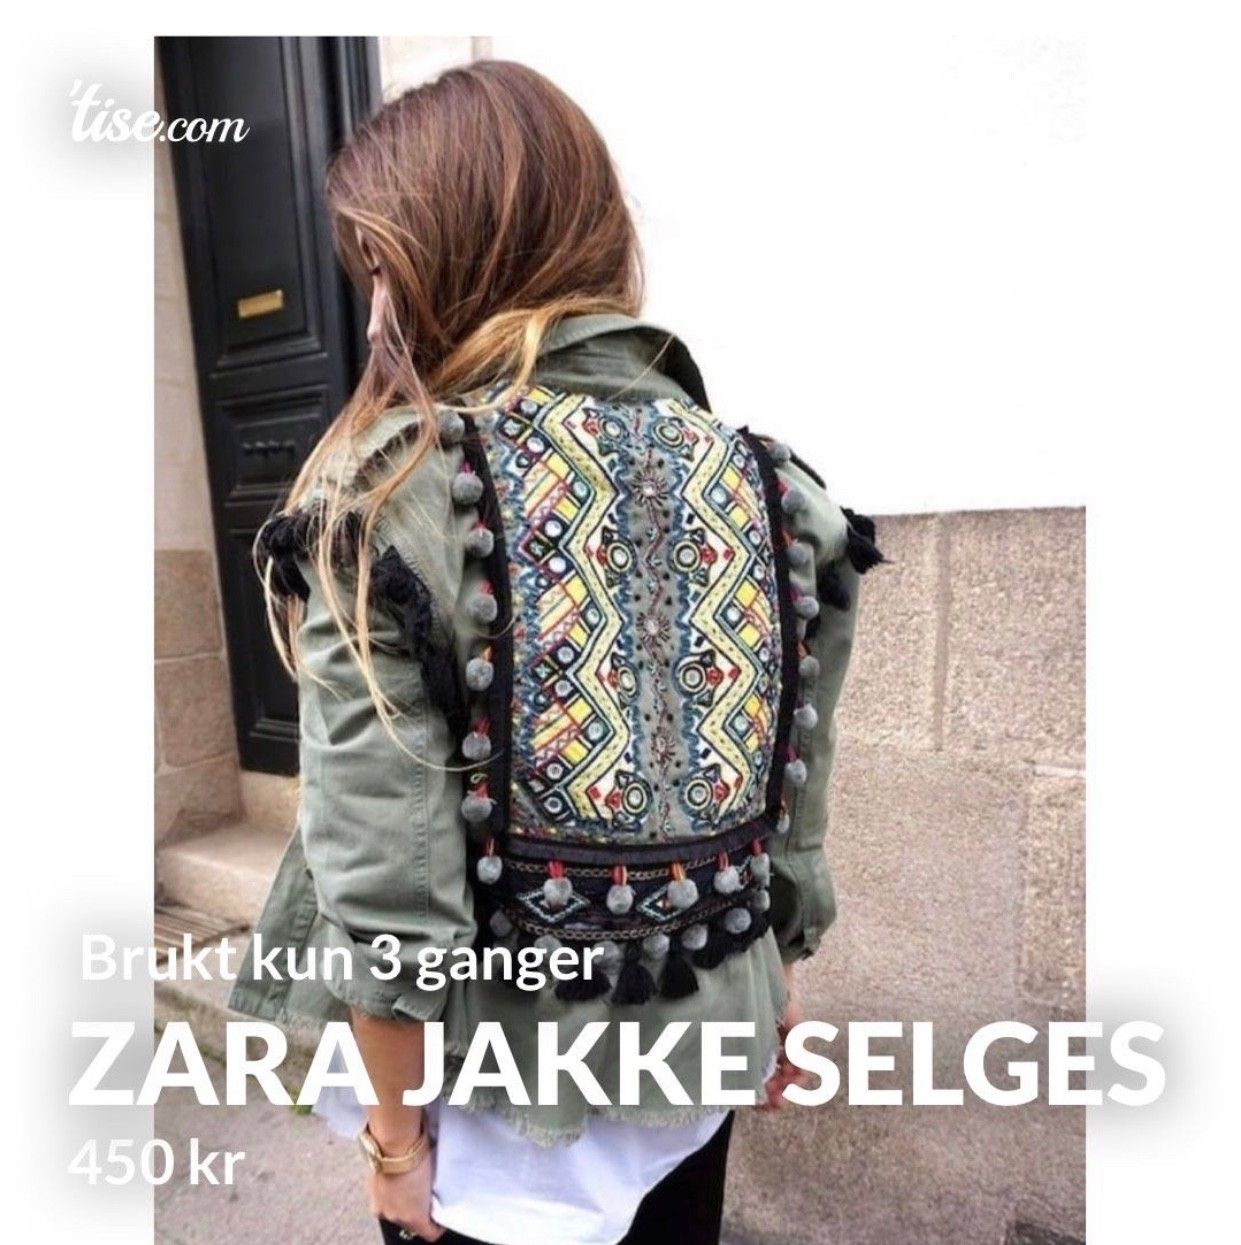 Populær Zara jakke selges billig   FINN.no